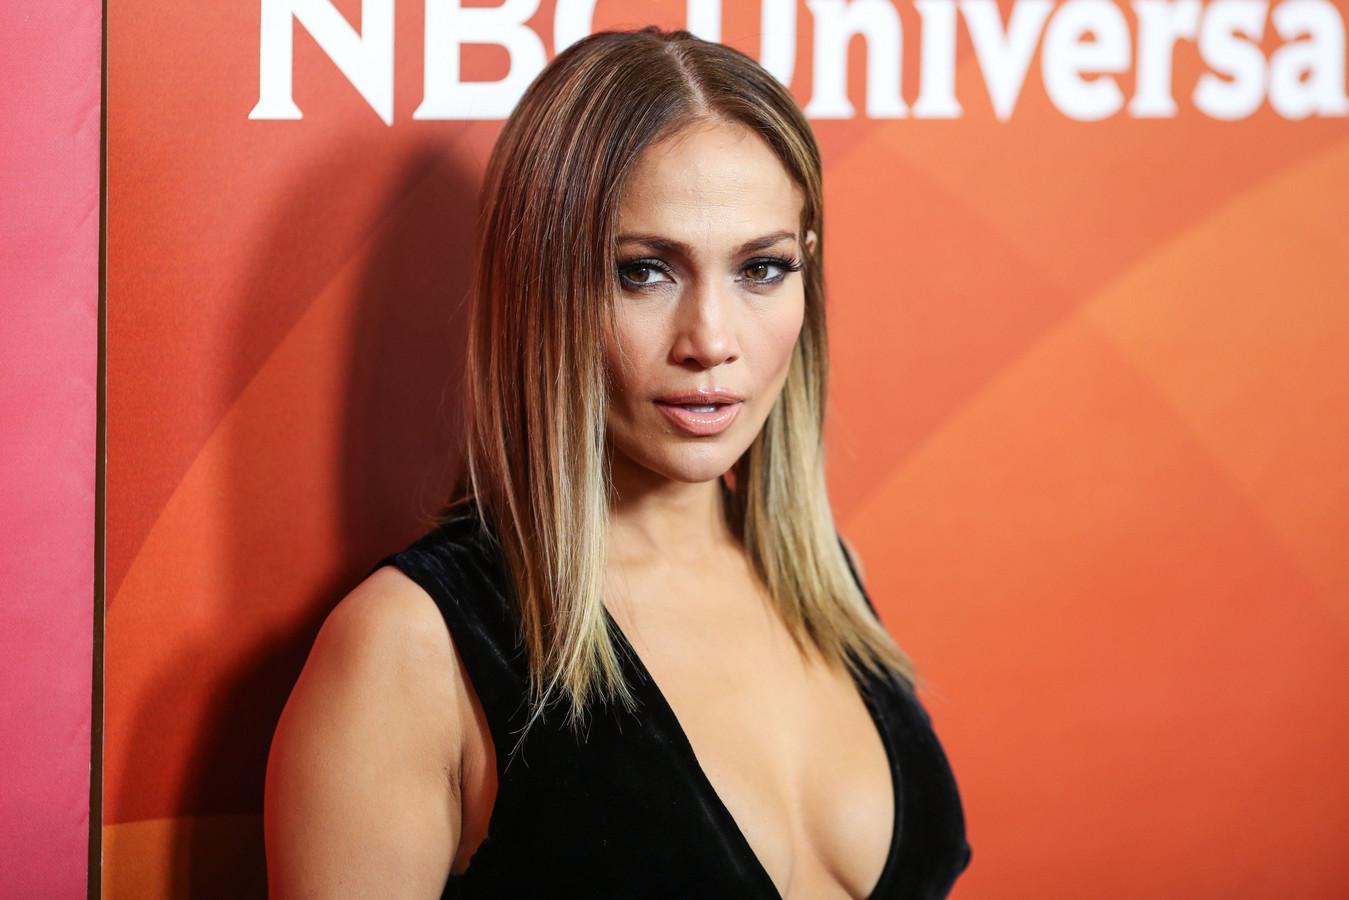 Alex Rodriguez: Jennifer is geweldig | Foto | pzc.nl Jennifer Lopez And Alex Rodriguez